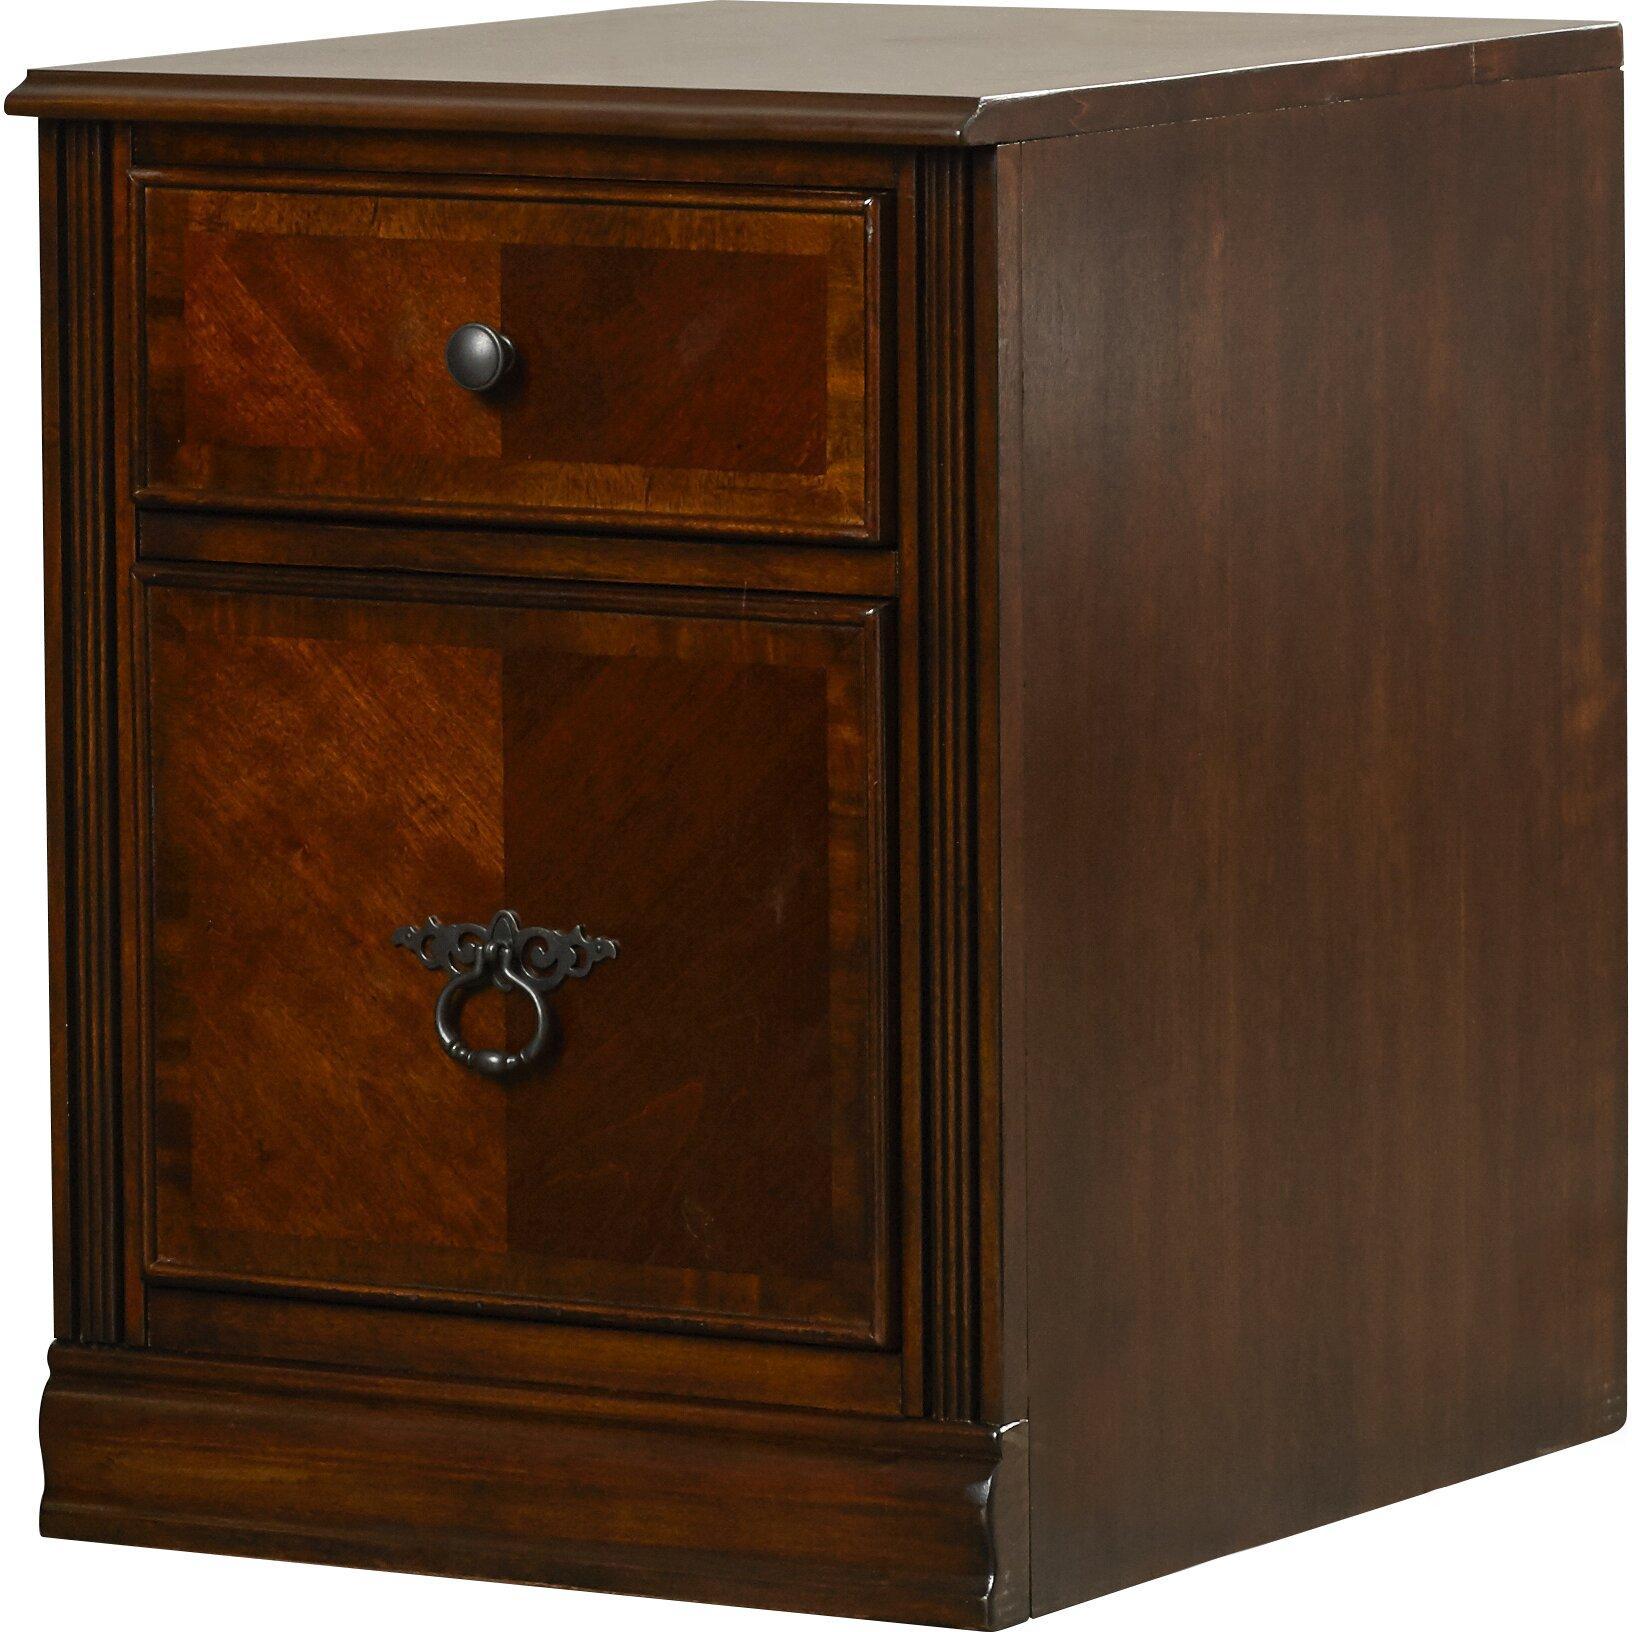 Brookhaven Kitchen Cabinets: Whalen Brookhaven File Cabinet